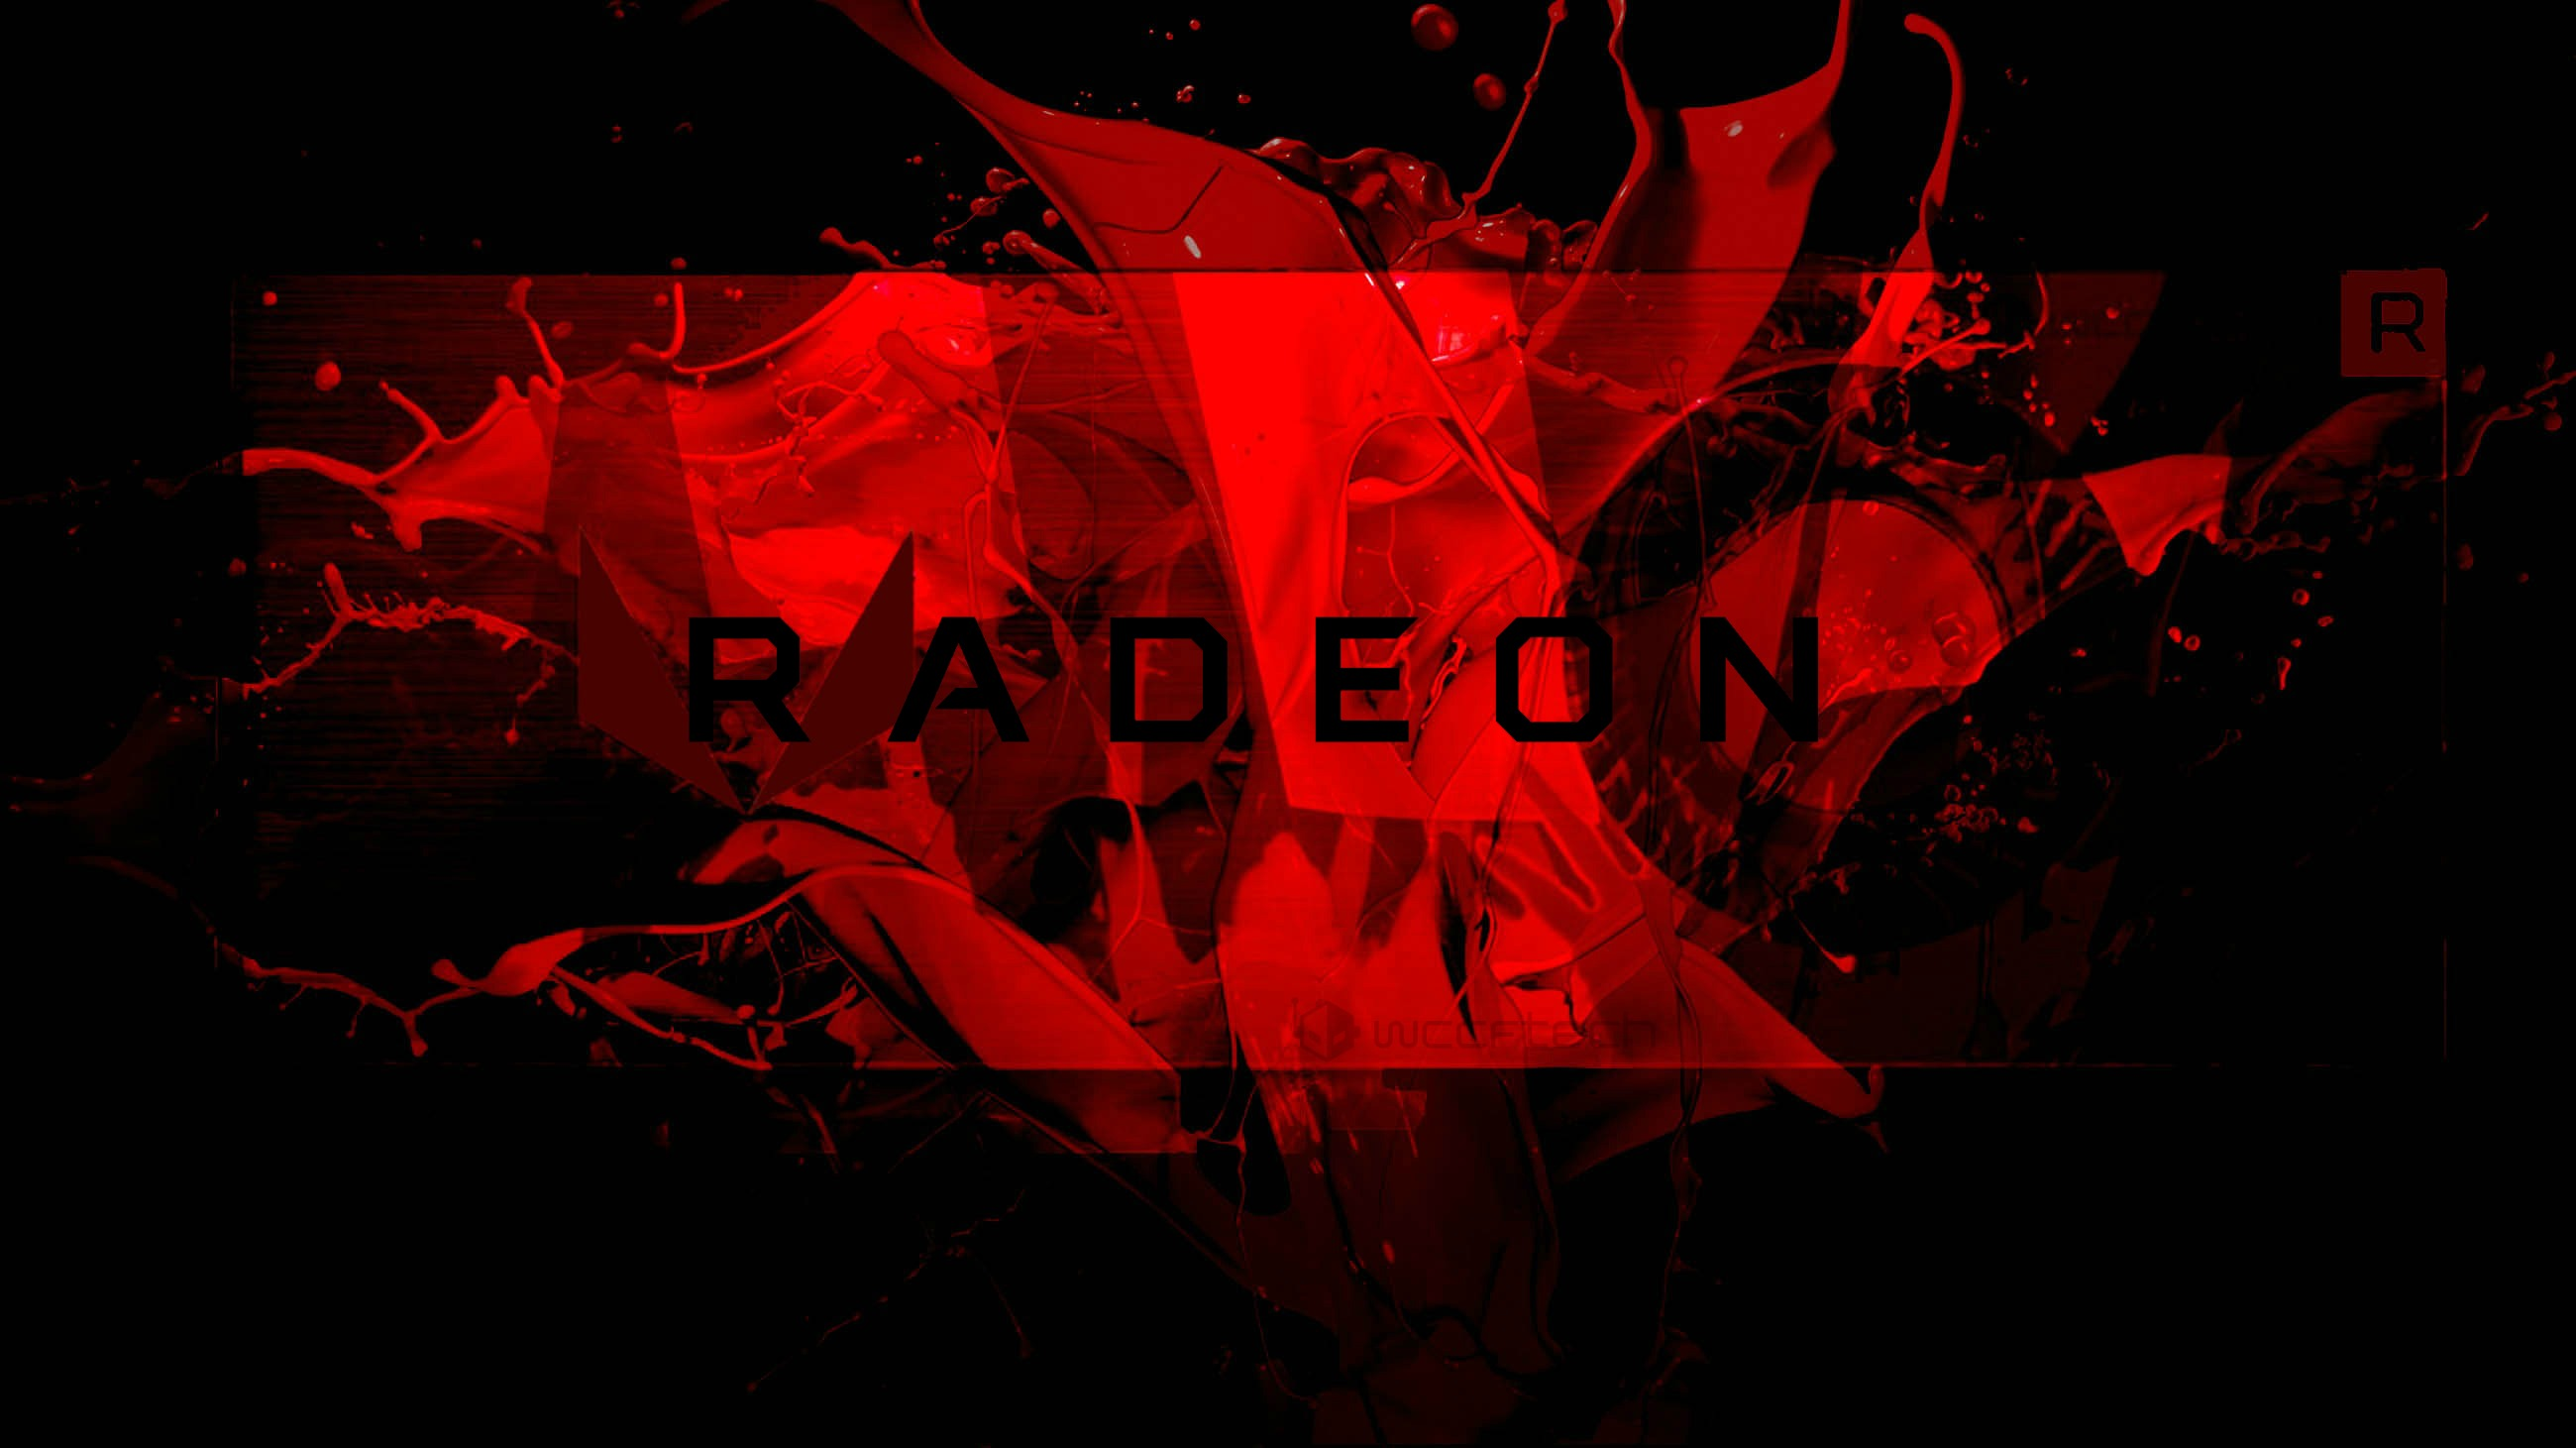 Amd Navi 23 Nvidia Killer Gpu With Hardware Ray Tracing Rumored To Launch Next Year